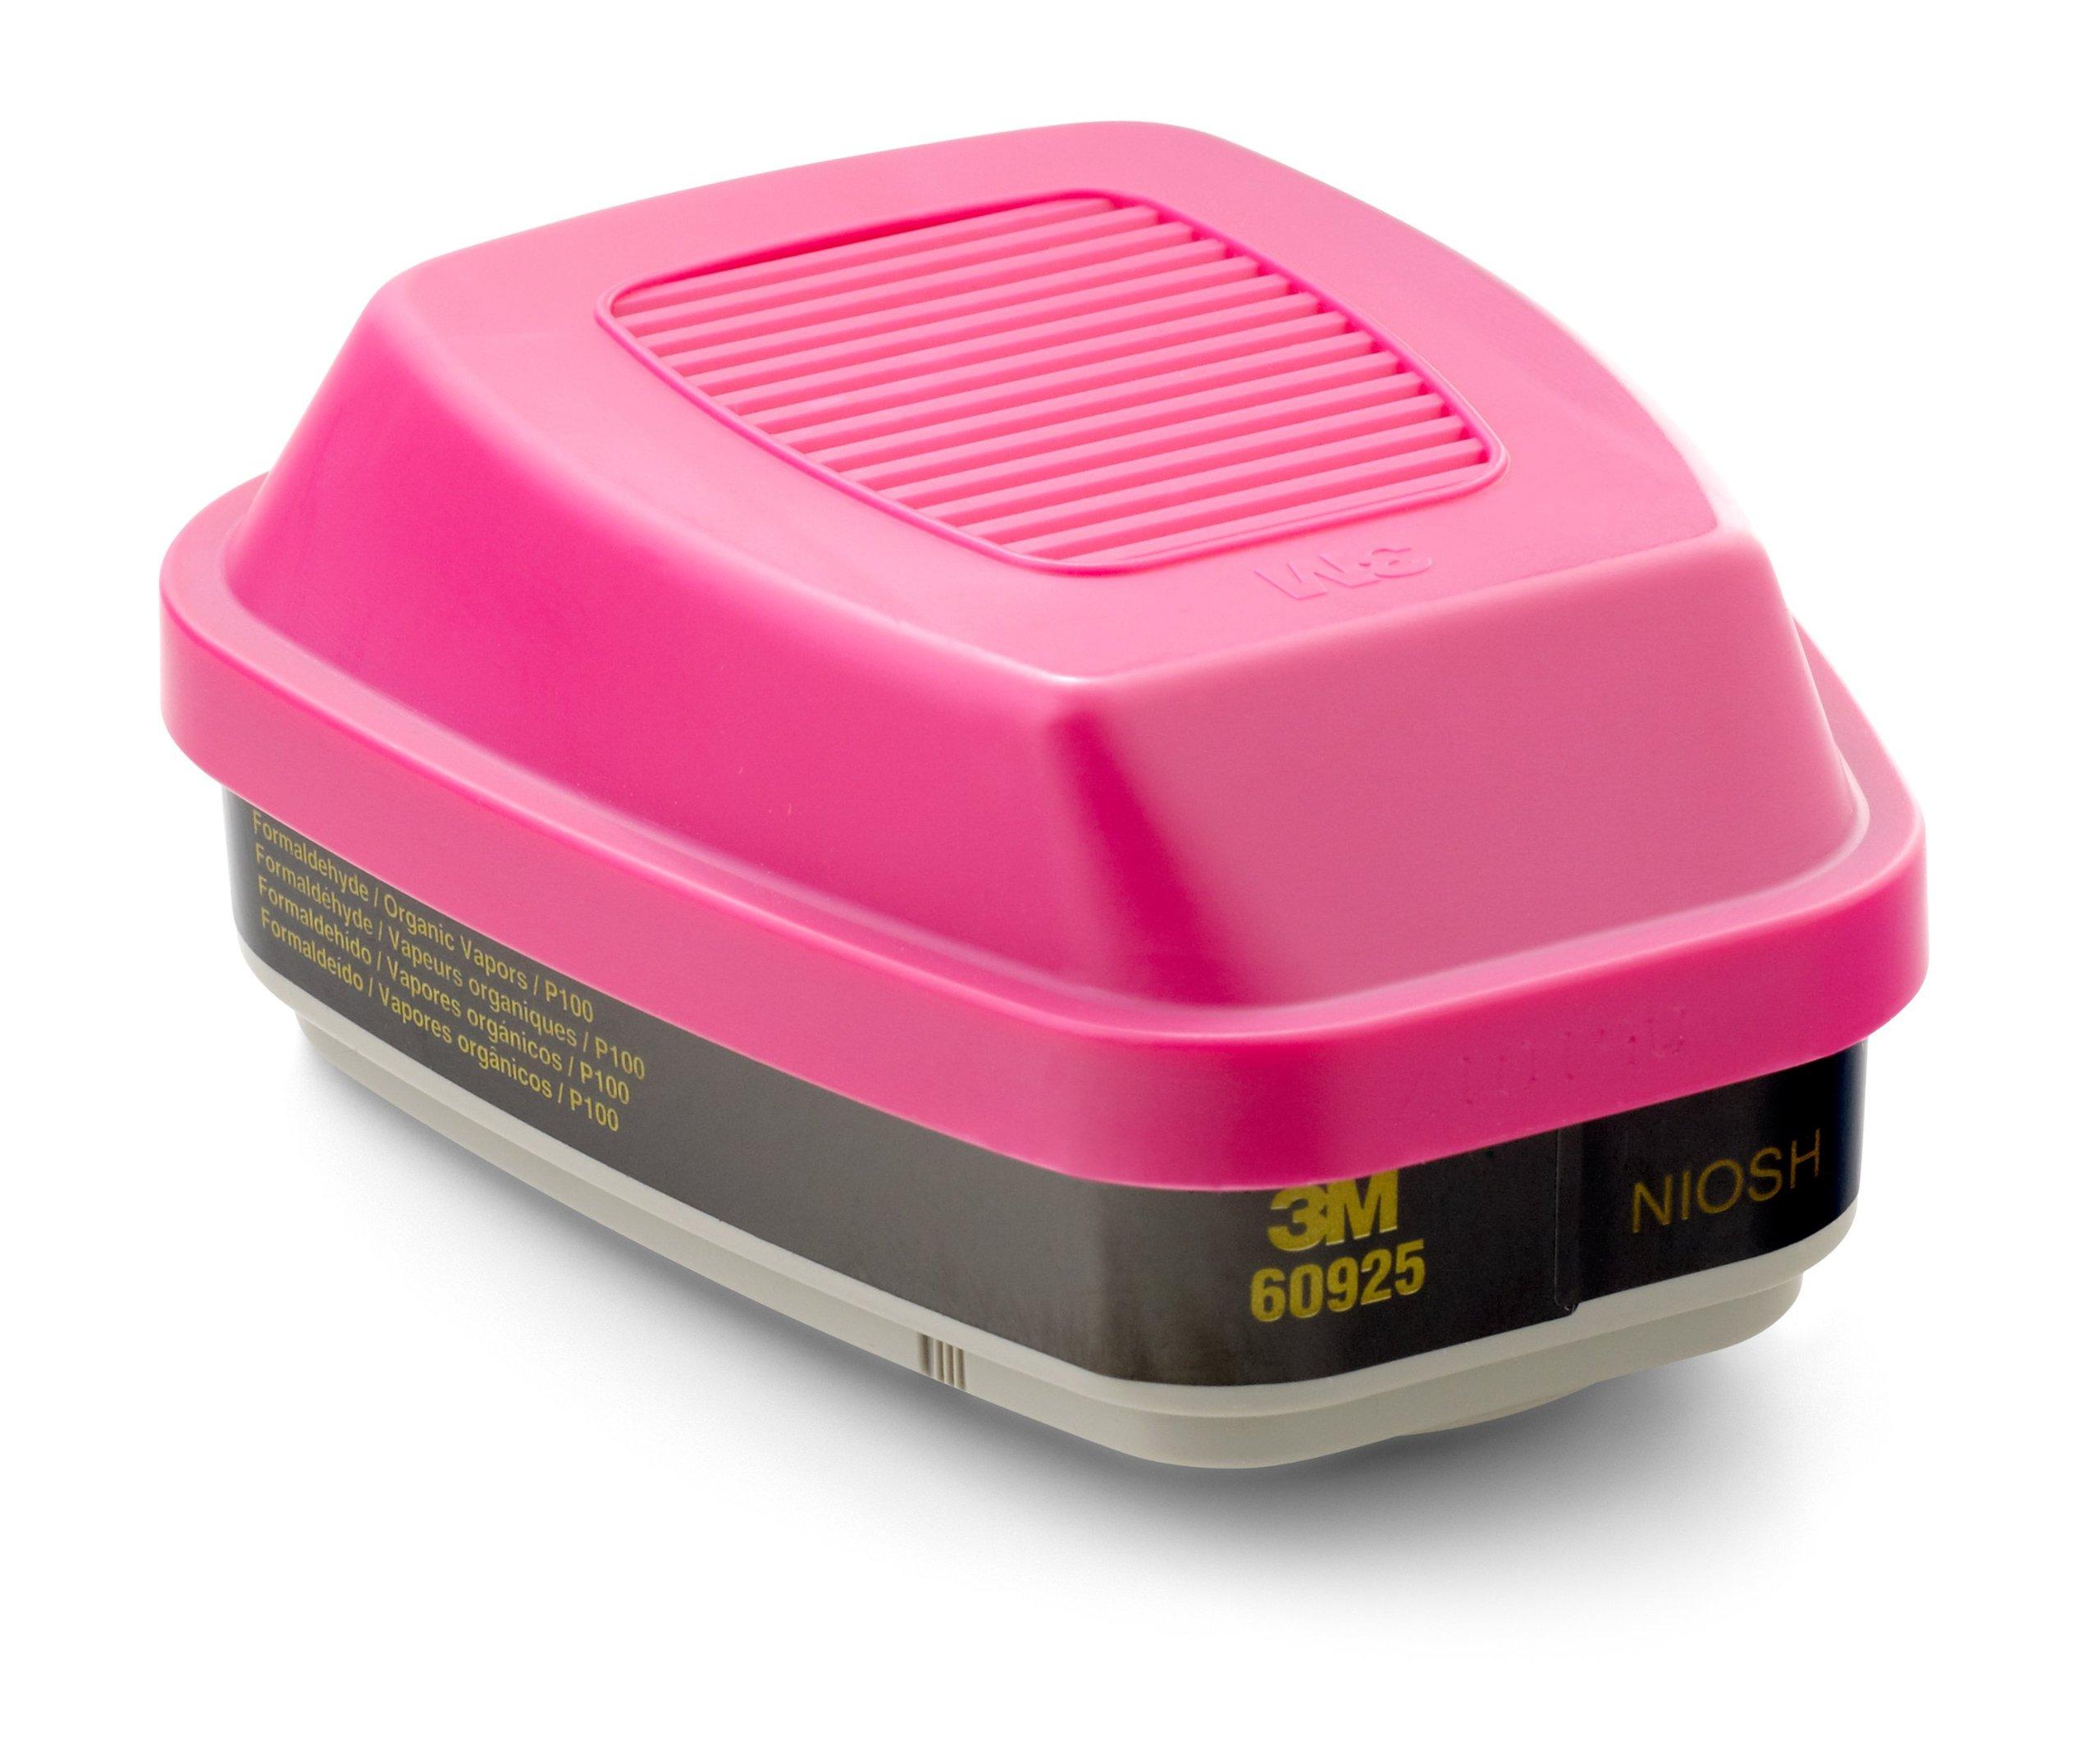 3M Formaldehyde Organic Vapor Cartridge/Filter 60925, P100 Respiratory Protection (Pack of 2)